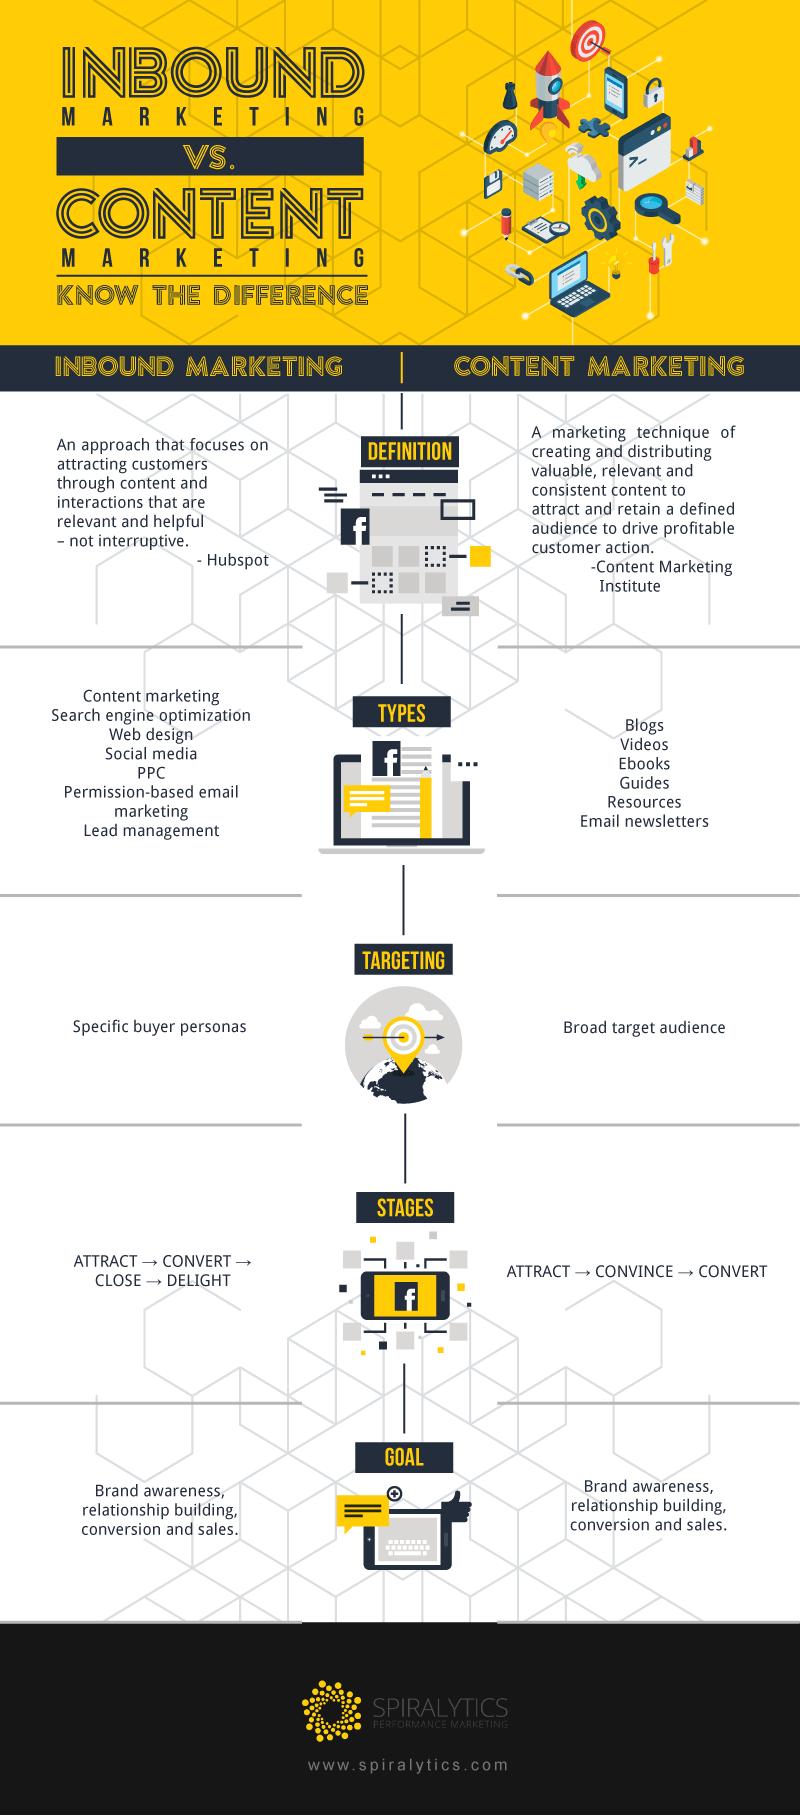 Infographic Content Marketing vs Inbound Marketing